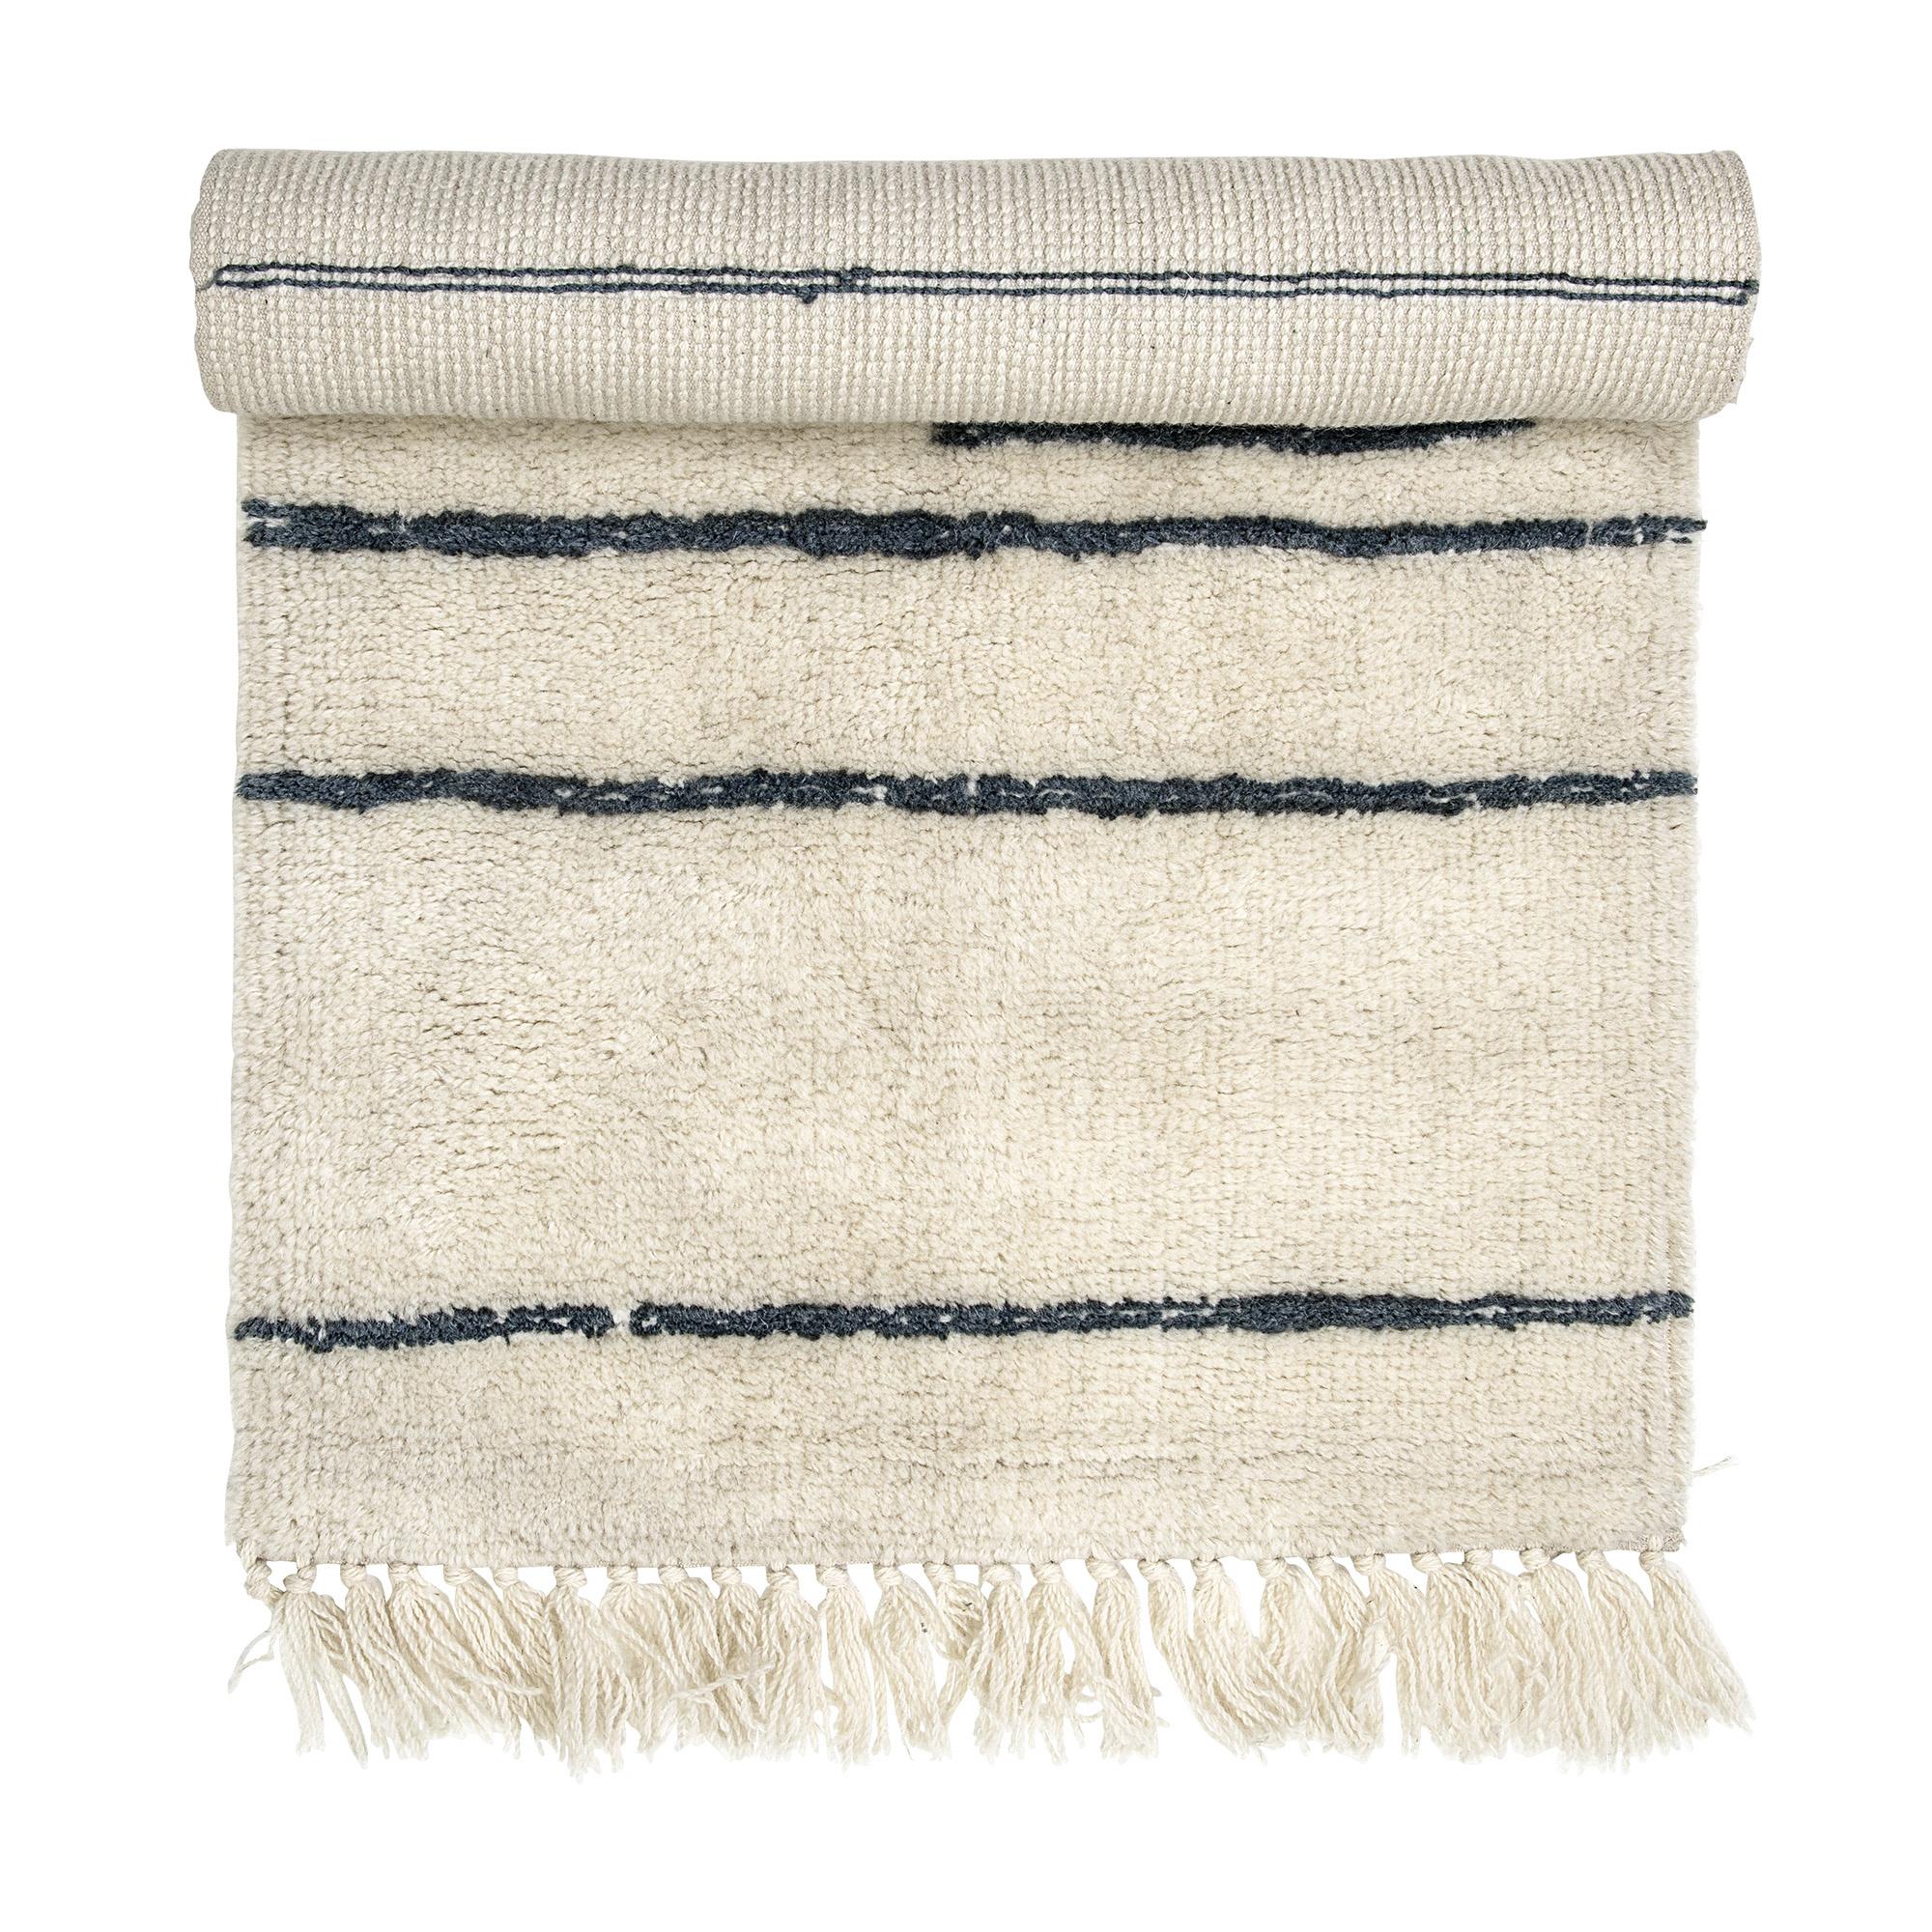 Bloomingville Scandinavian rug in wool - creme/grey - L120xW60 cm - Bloomingville